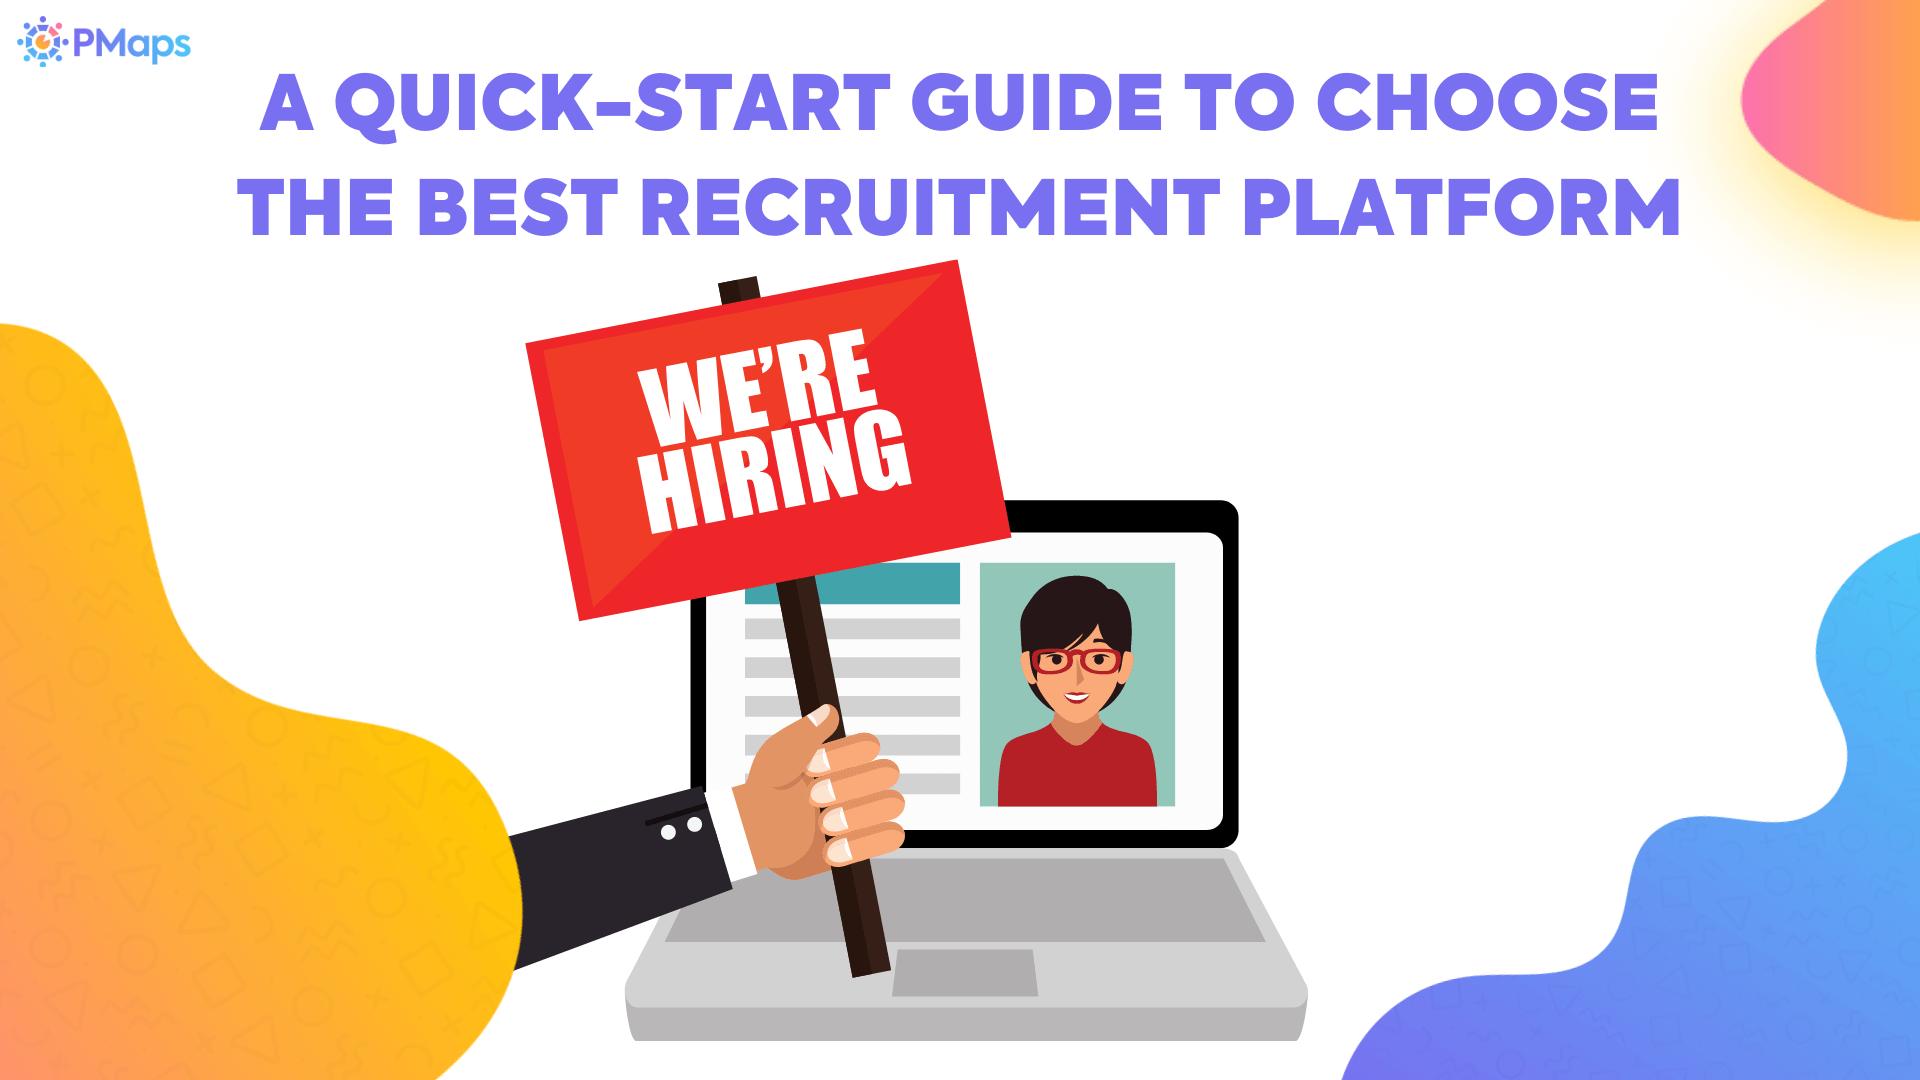 A Quick-Start Guide To Choose The Best Recruitment Platform